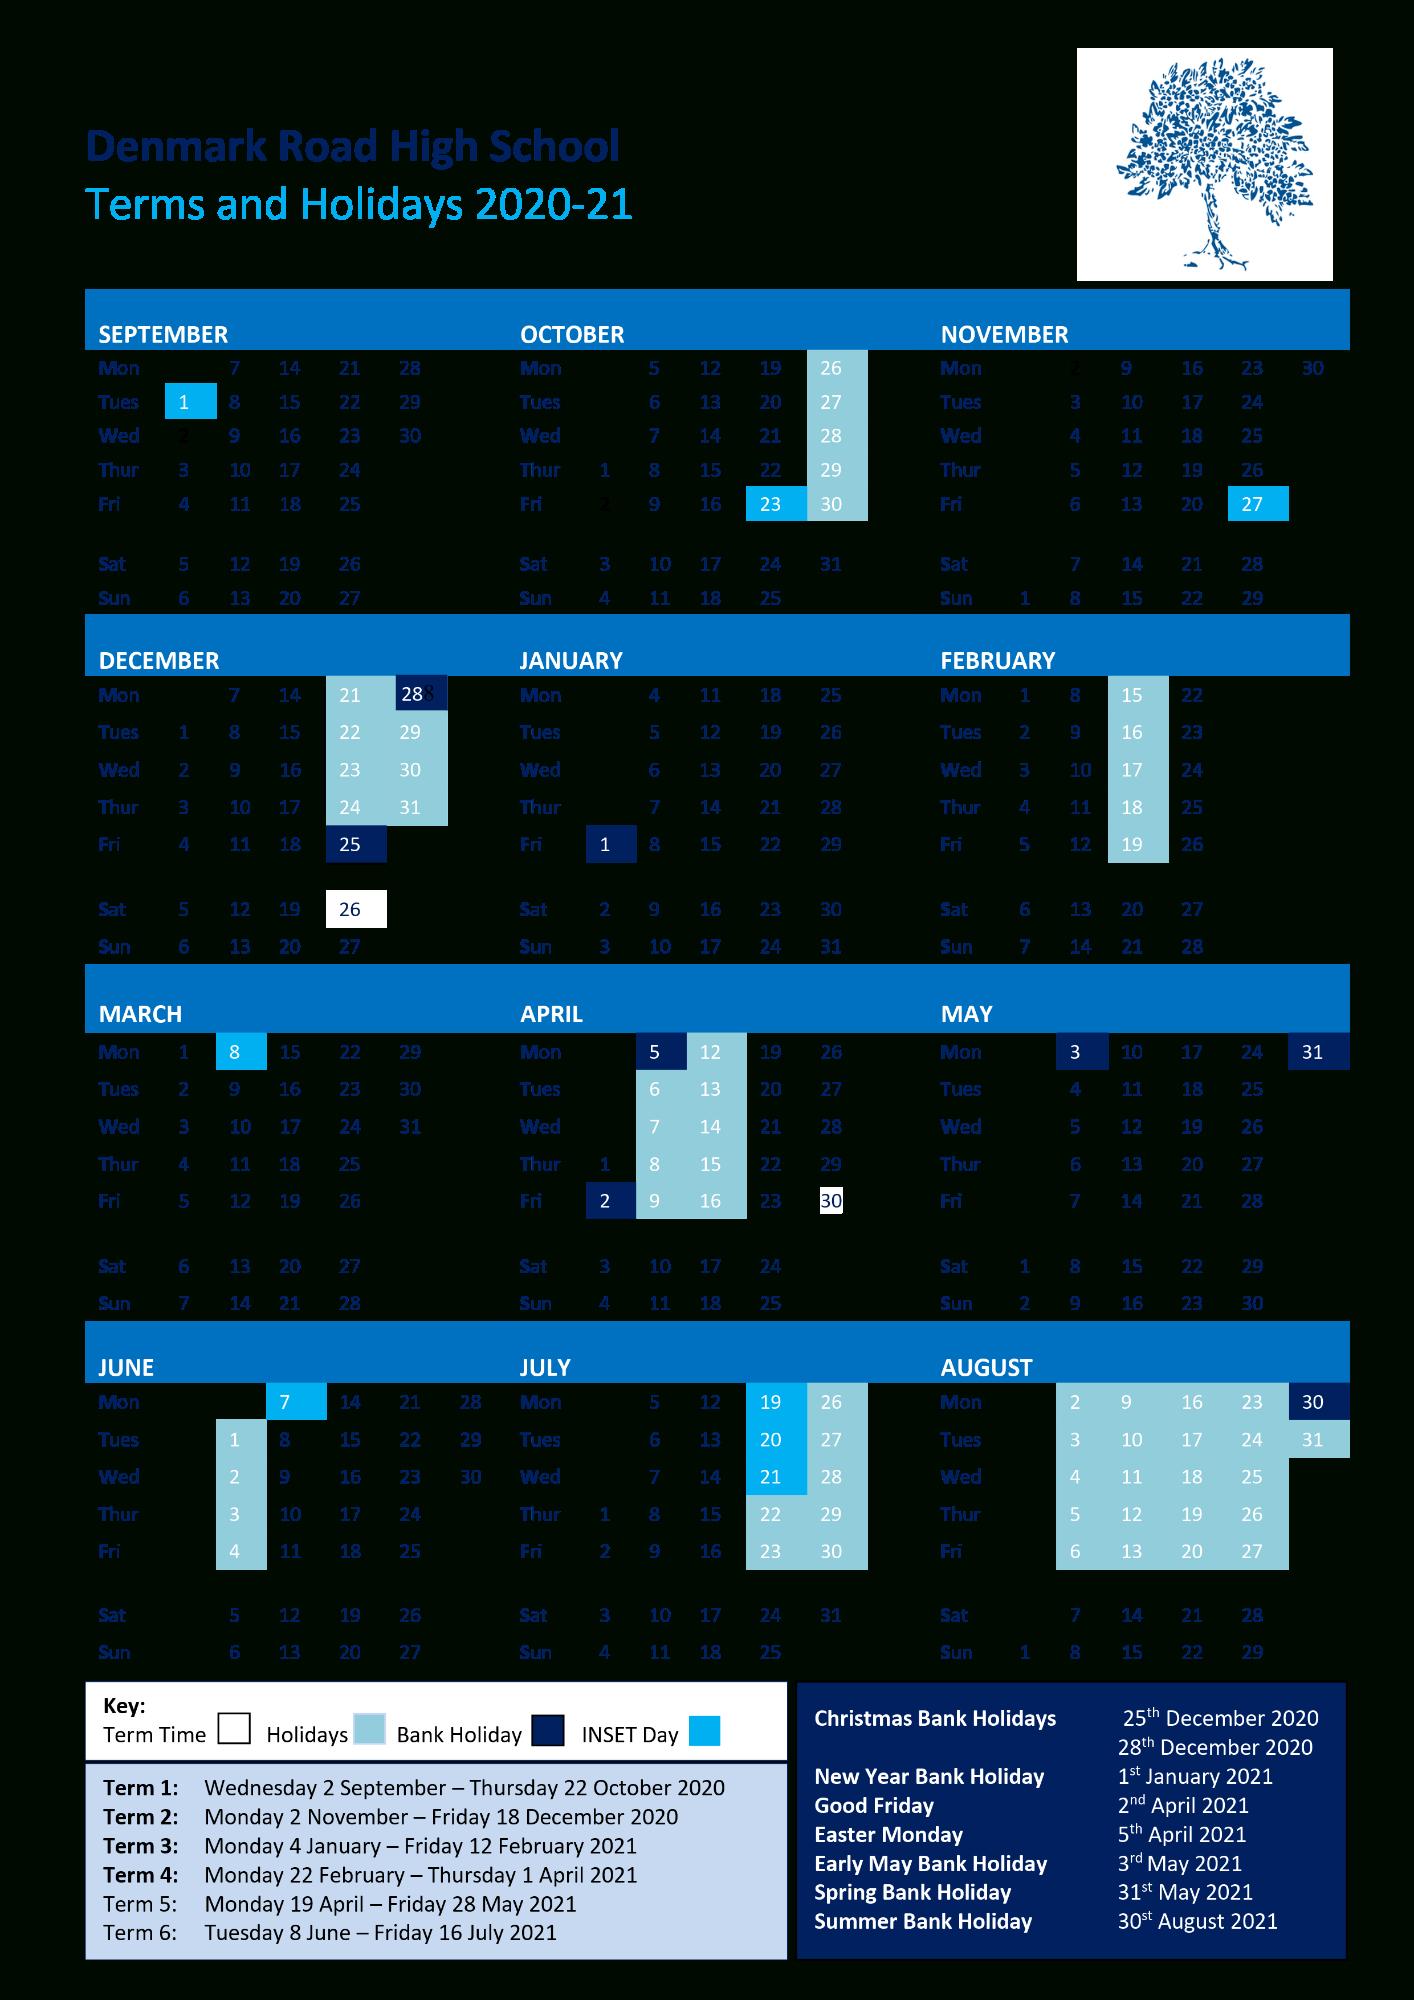 Denmark Road High School  Term Dates, Calendar & School Day with regard to Matravers School Calendar